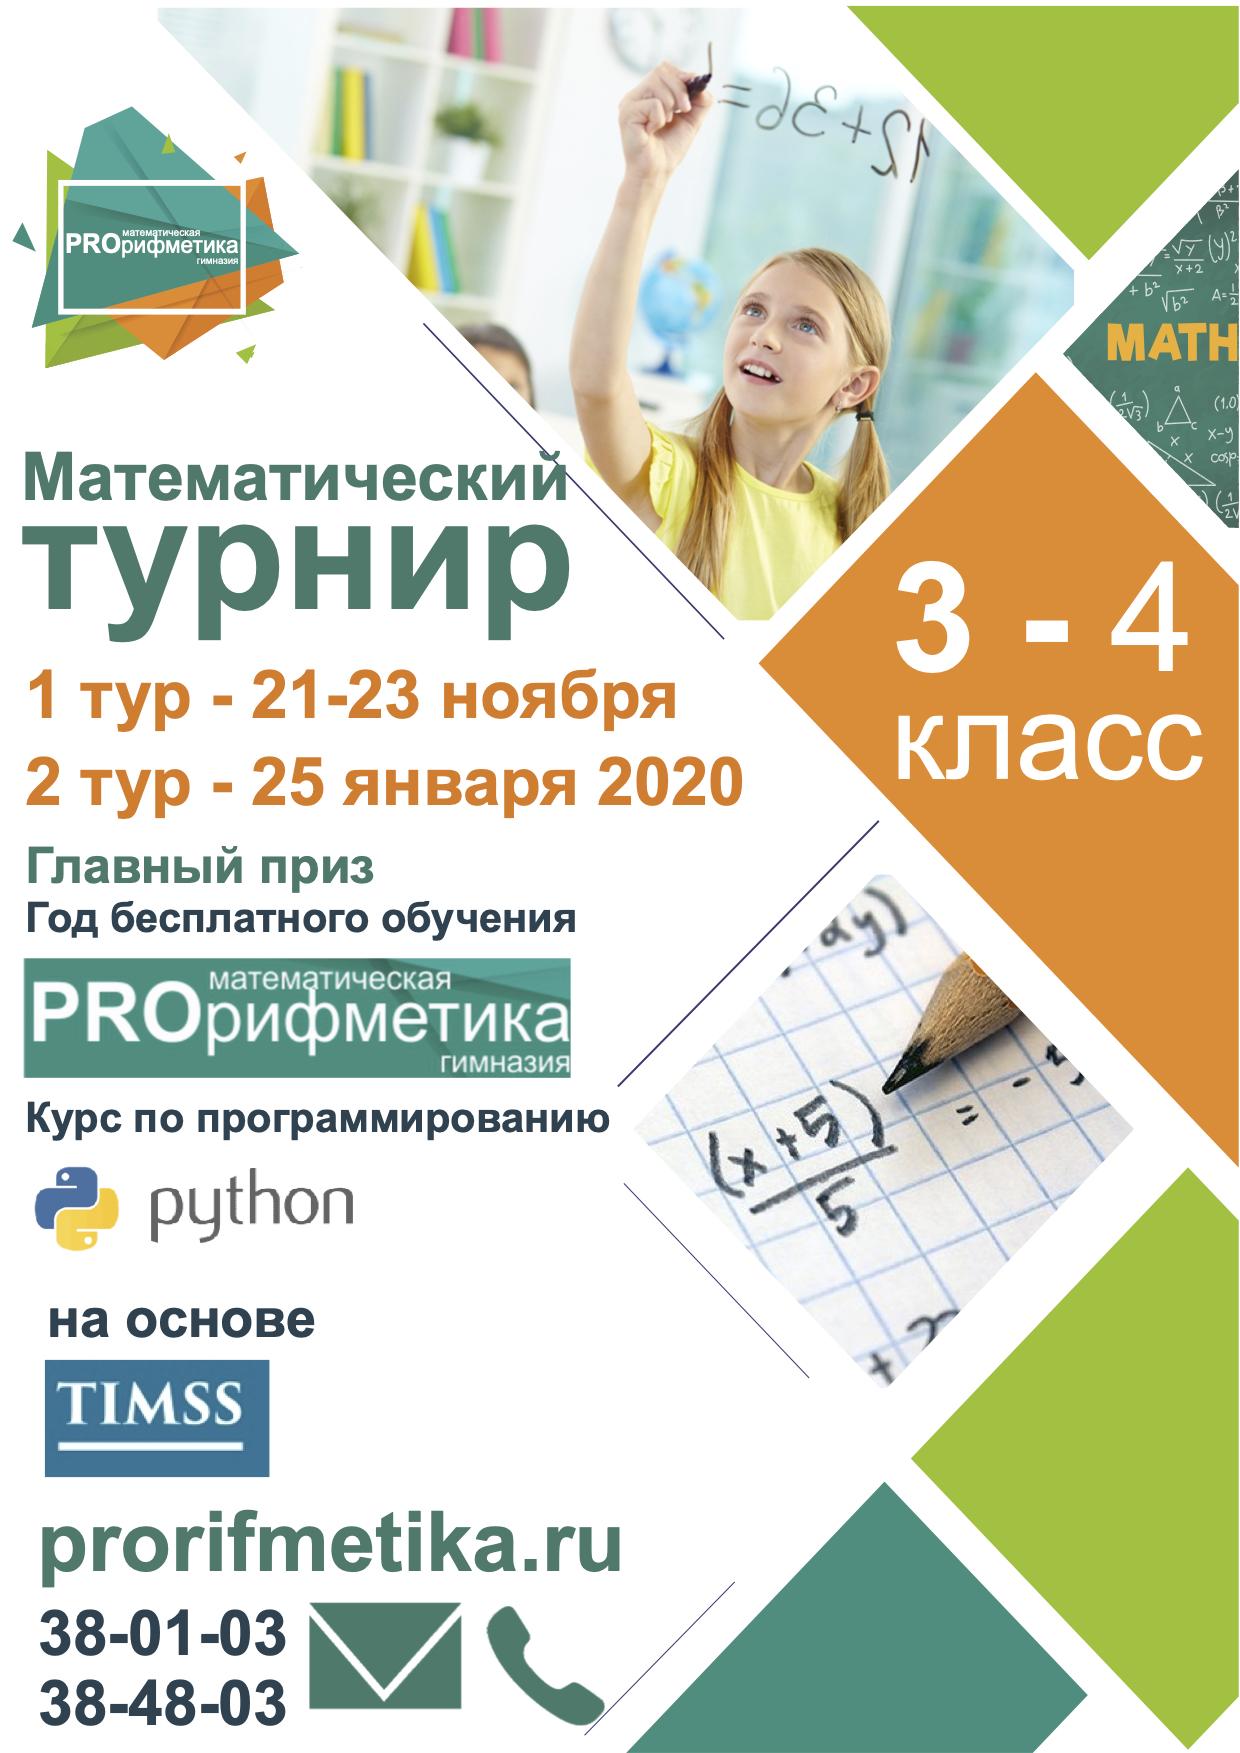 математический турнир 3-4